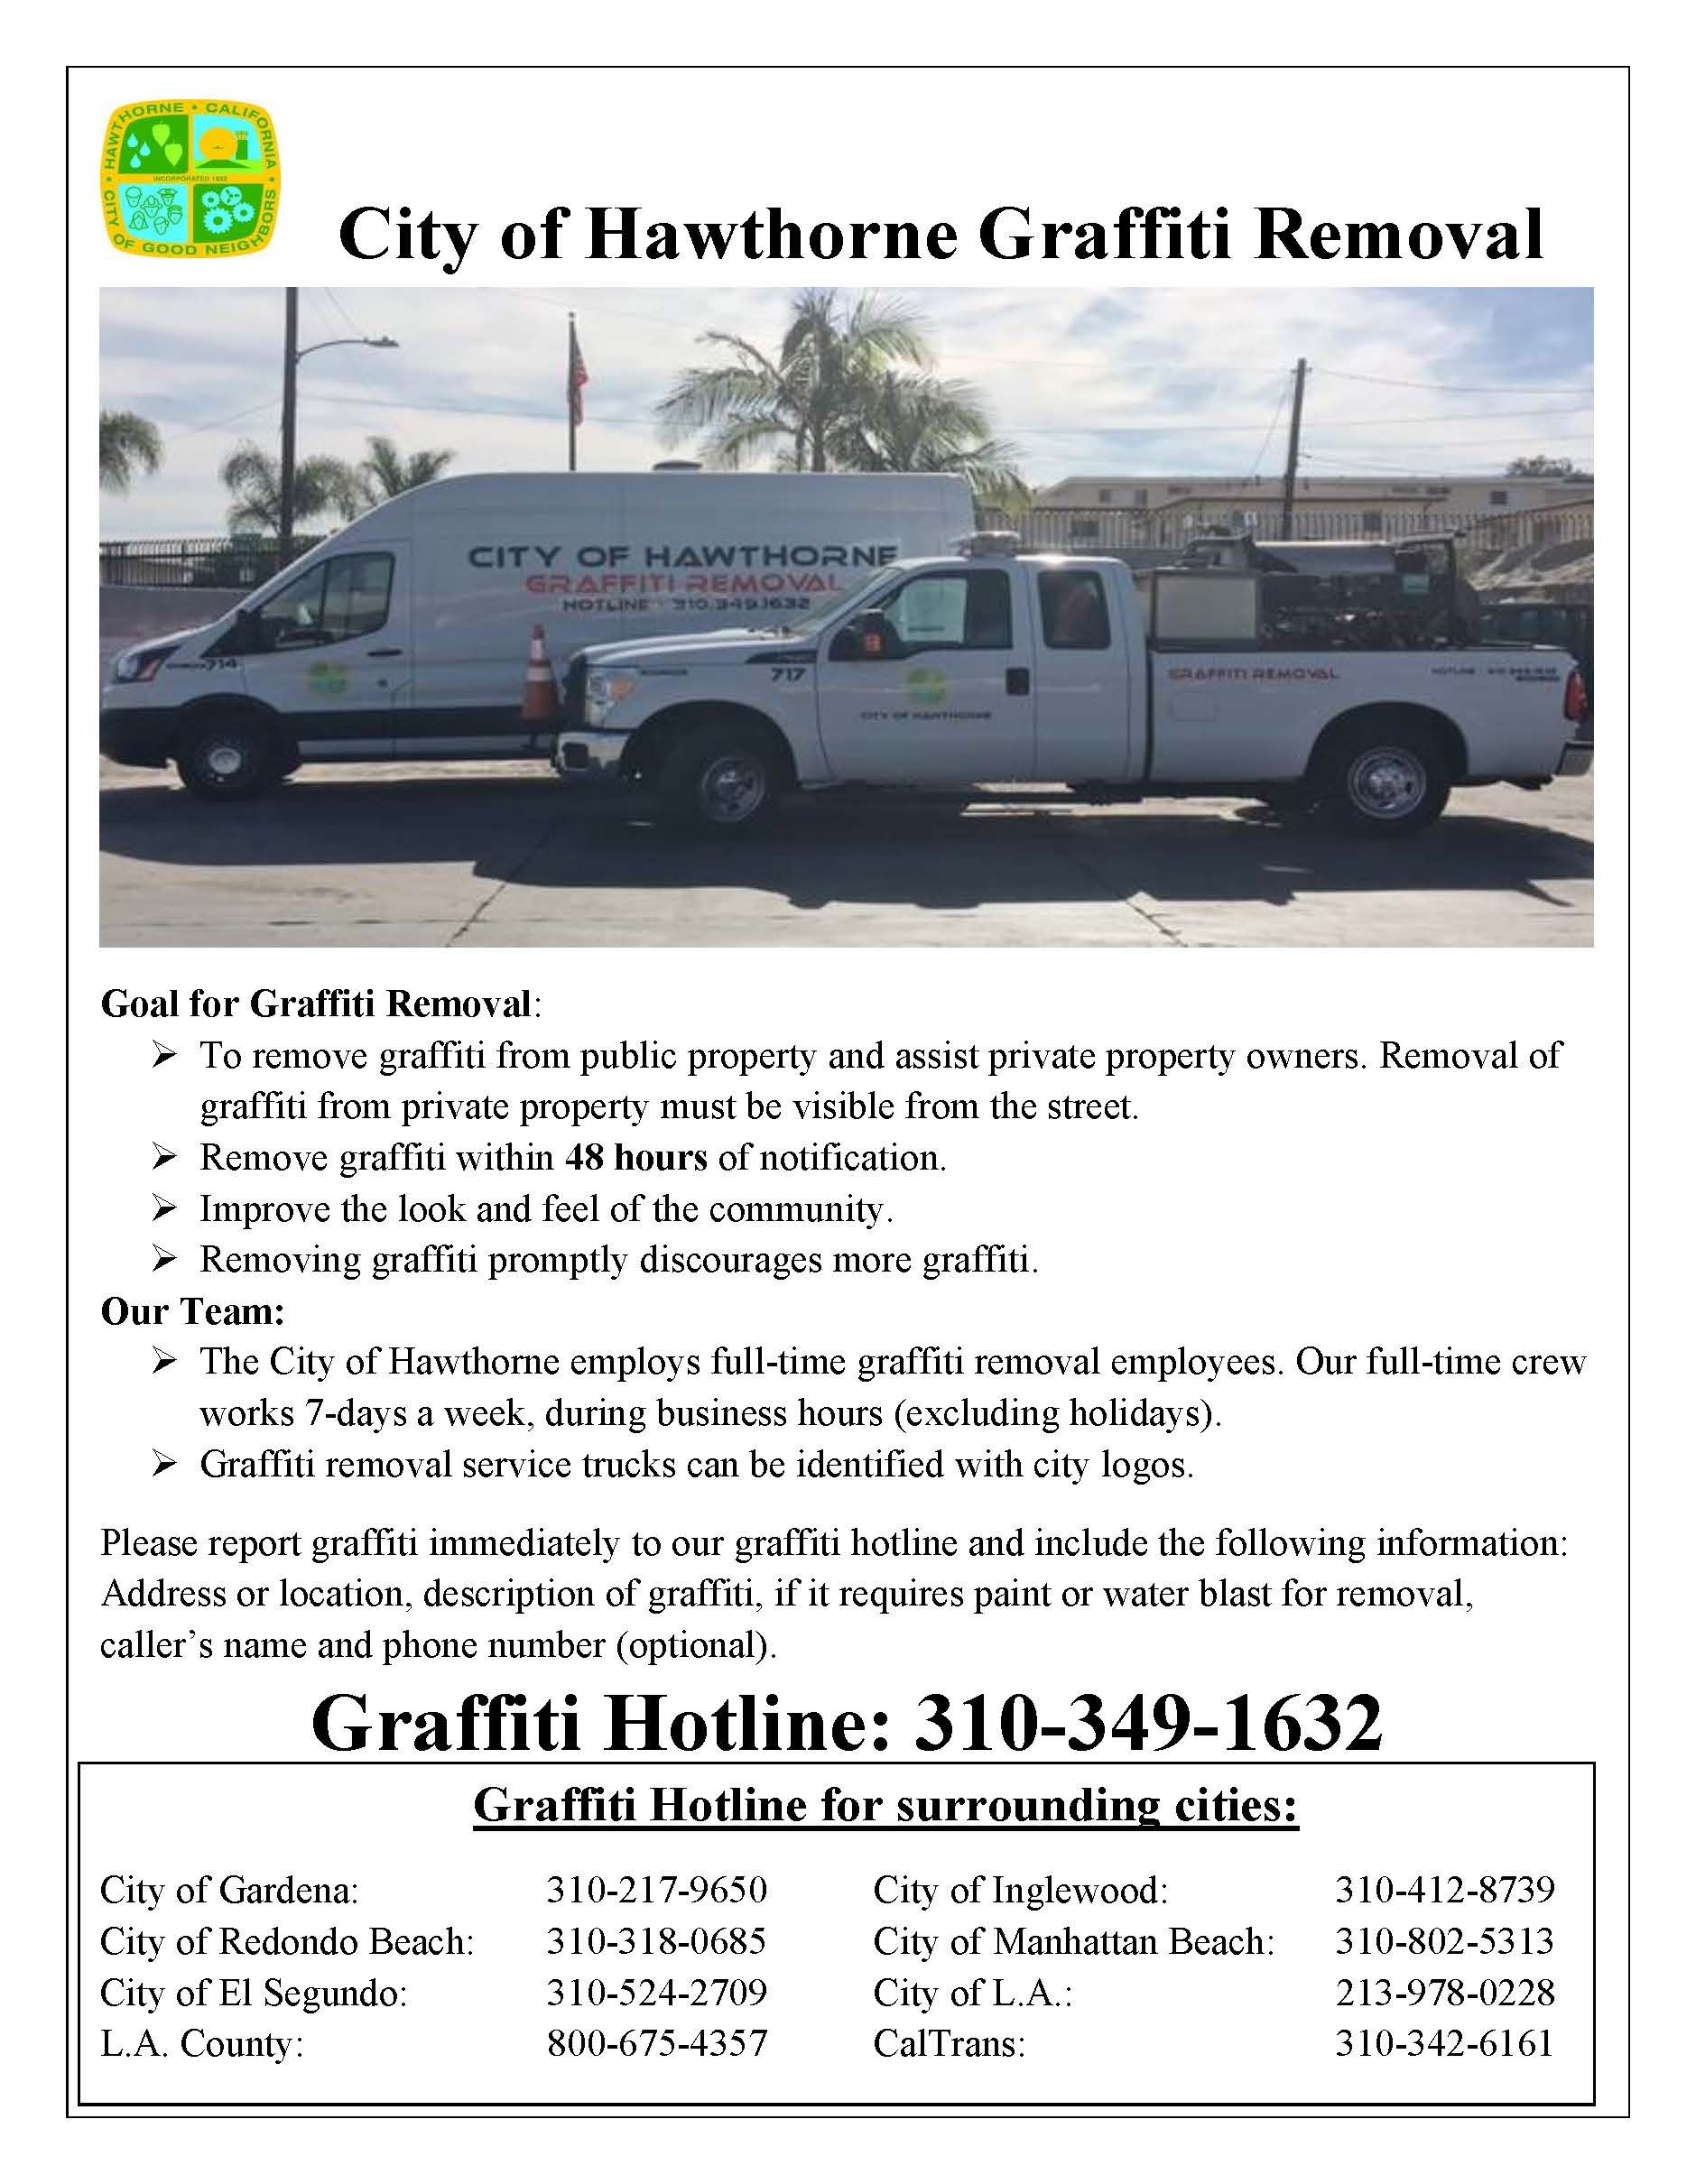 Graffiti Hotline